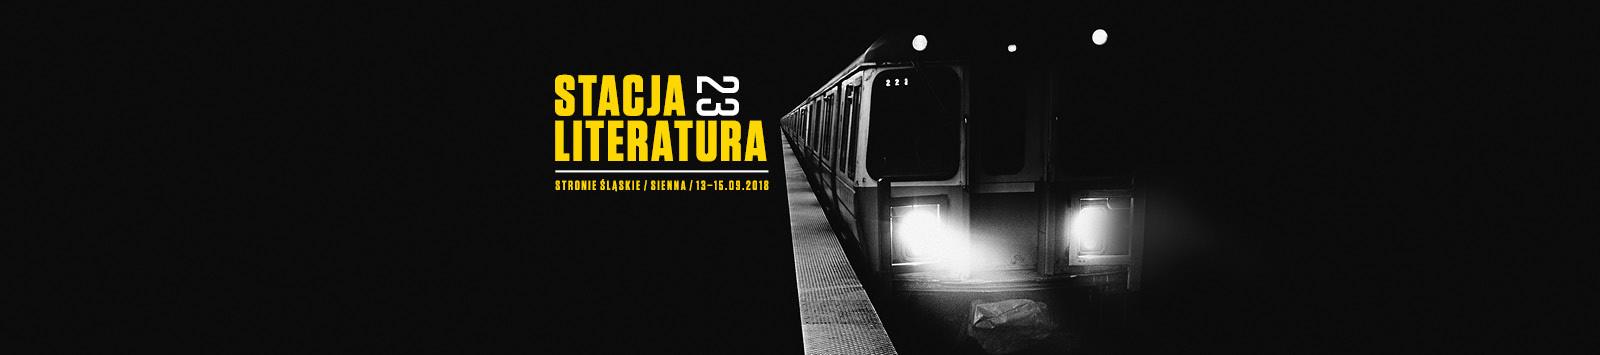 Stacja_Literatura_23_-_Top